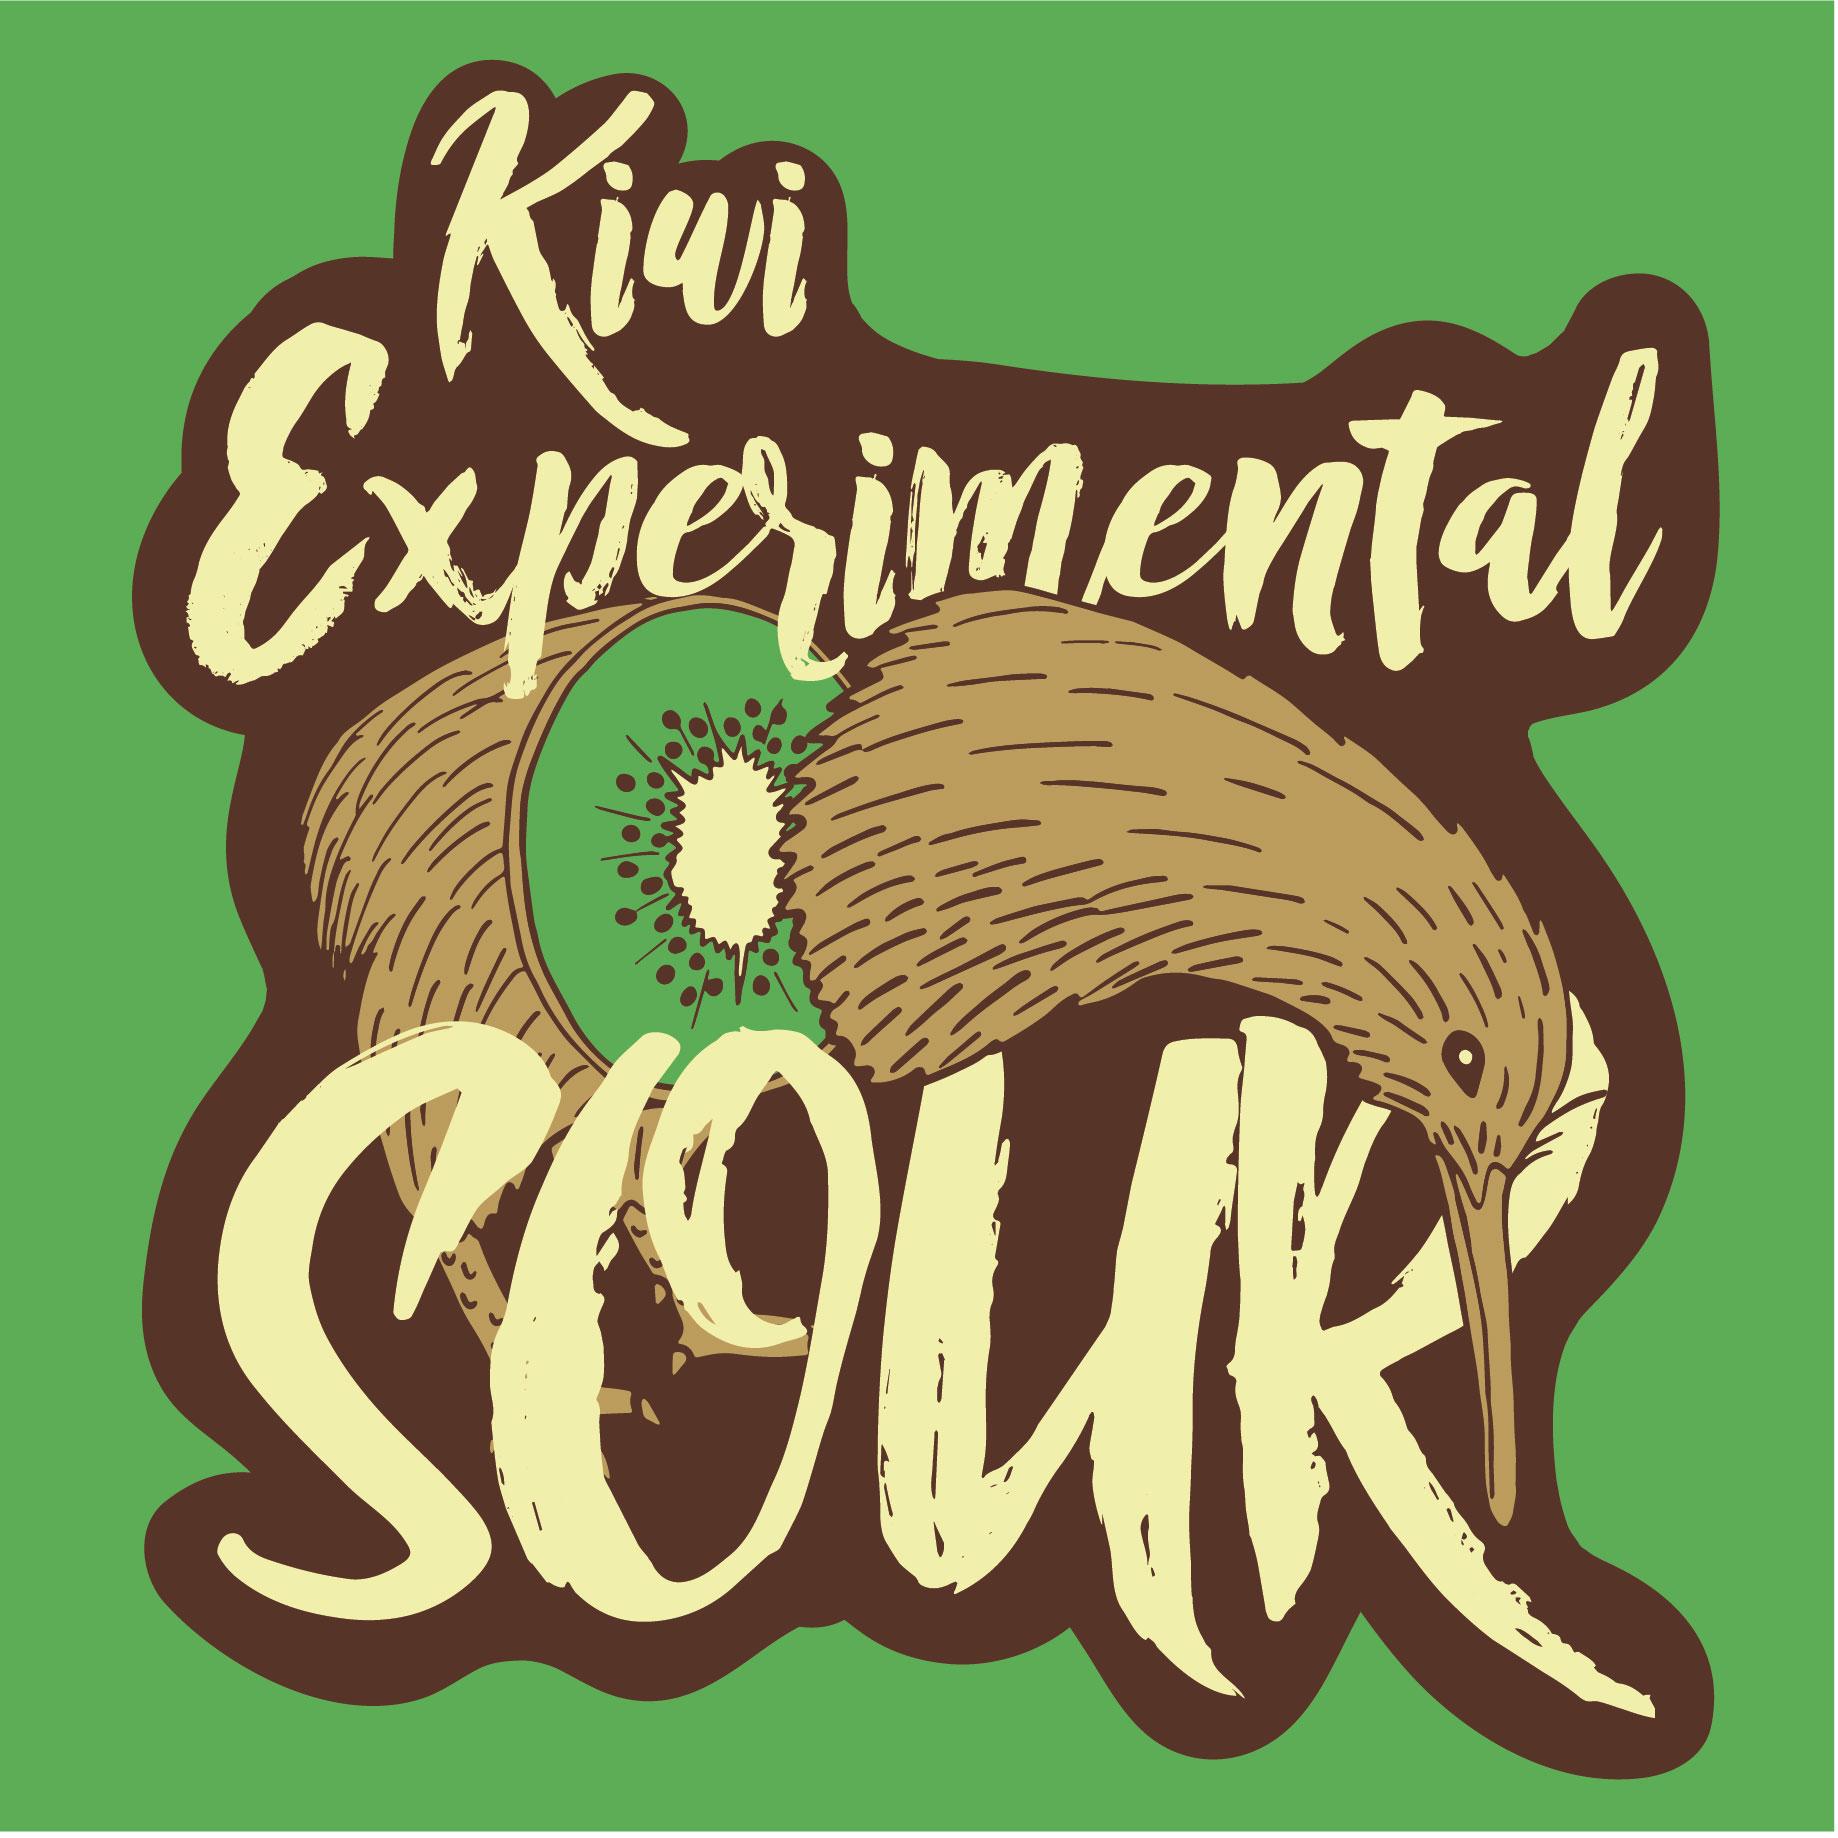 kiwi experimental sour VECTOR logo-01.jpg